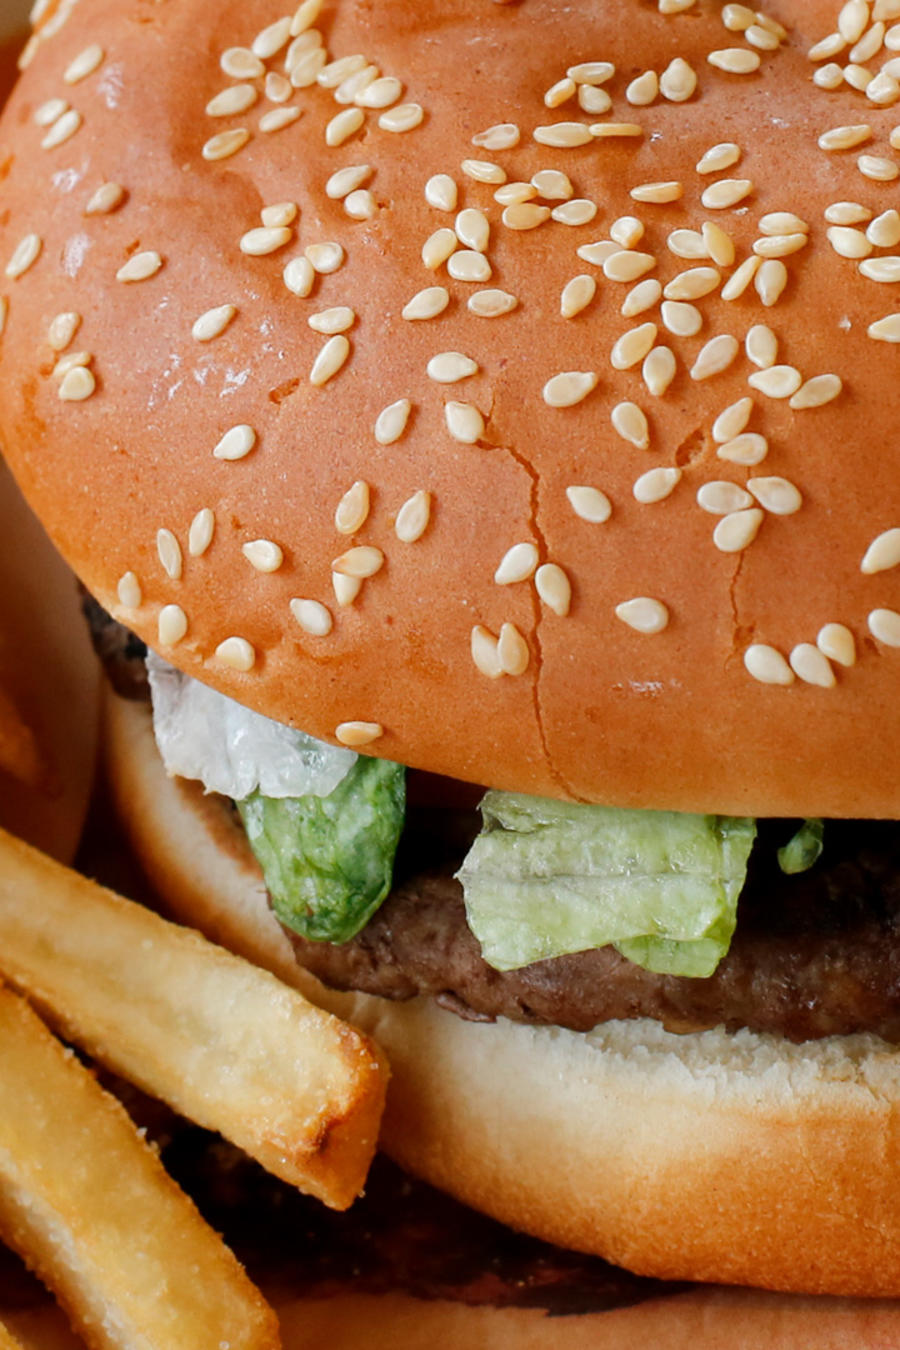 Una hamburguesa de la marca Burger King en una imagen de archivo